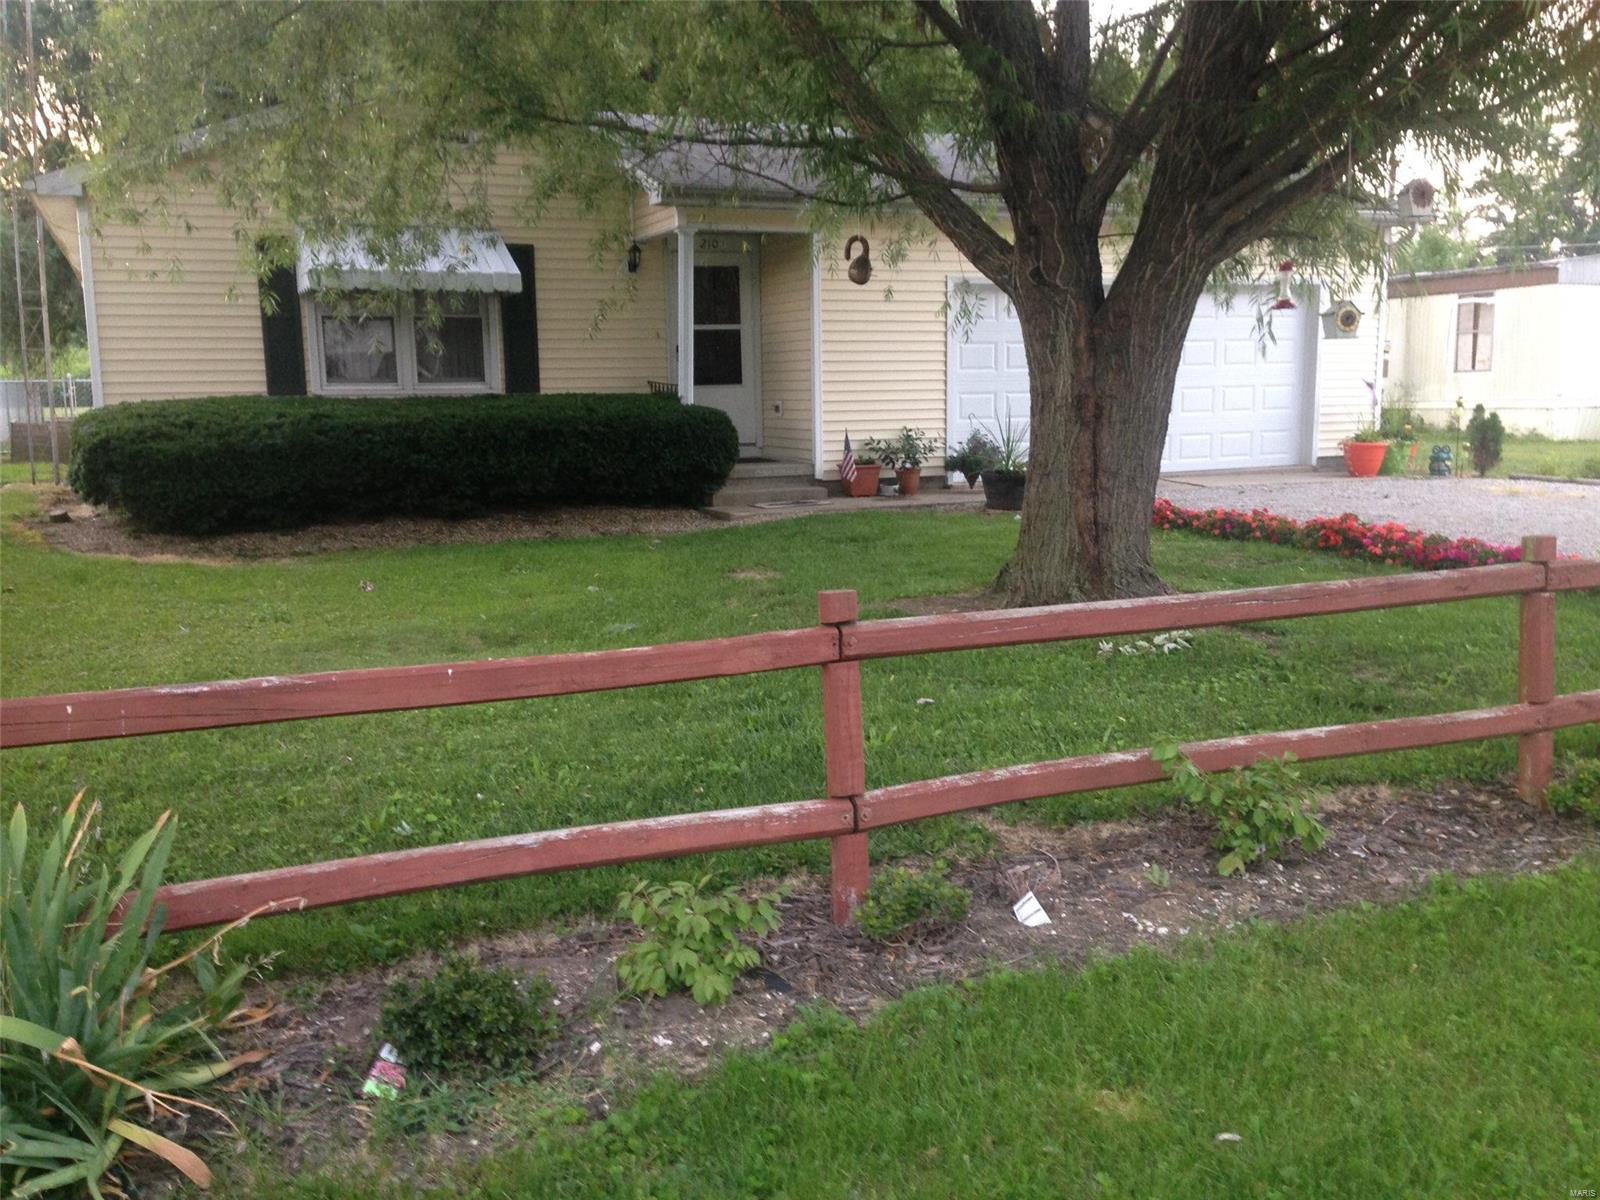 210 N Jefferson Property Photo - Ramsey, IL real estate listing